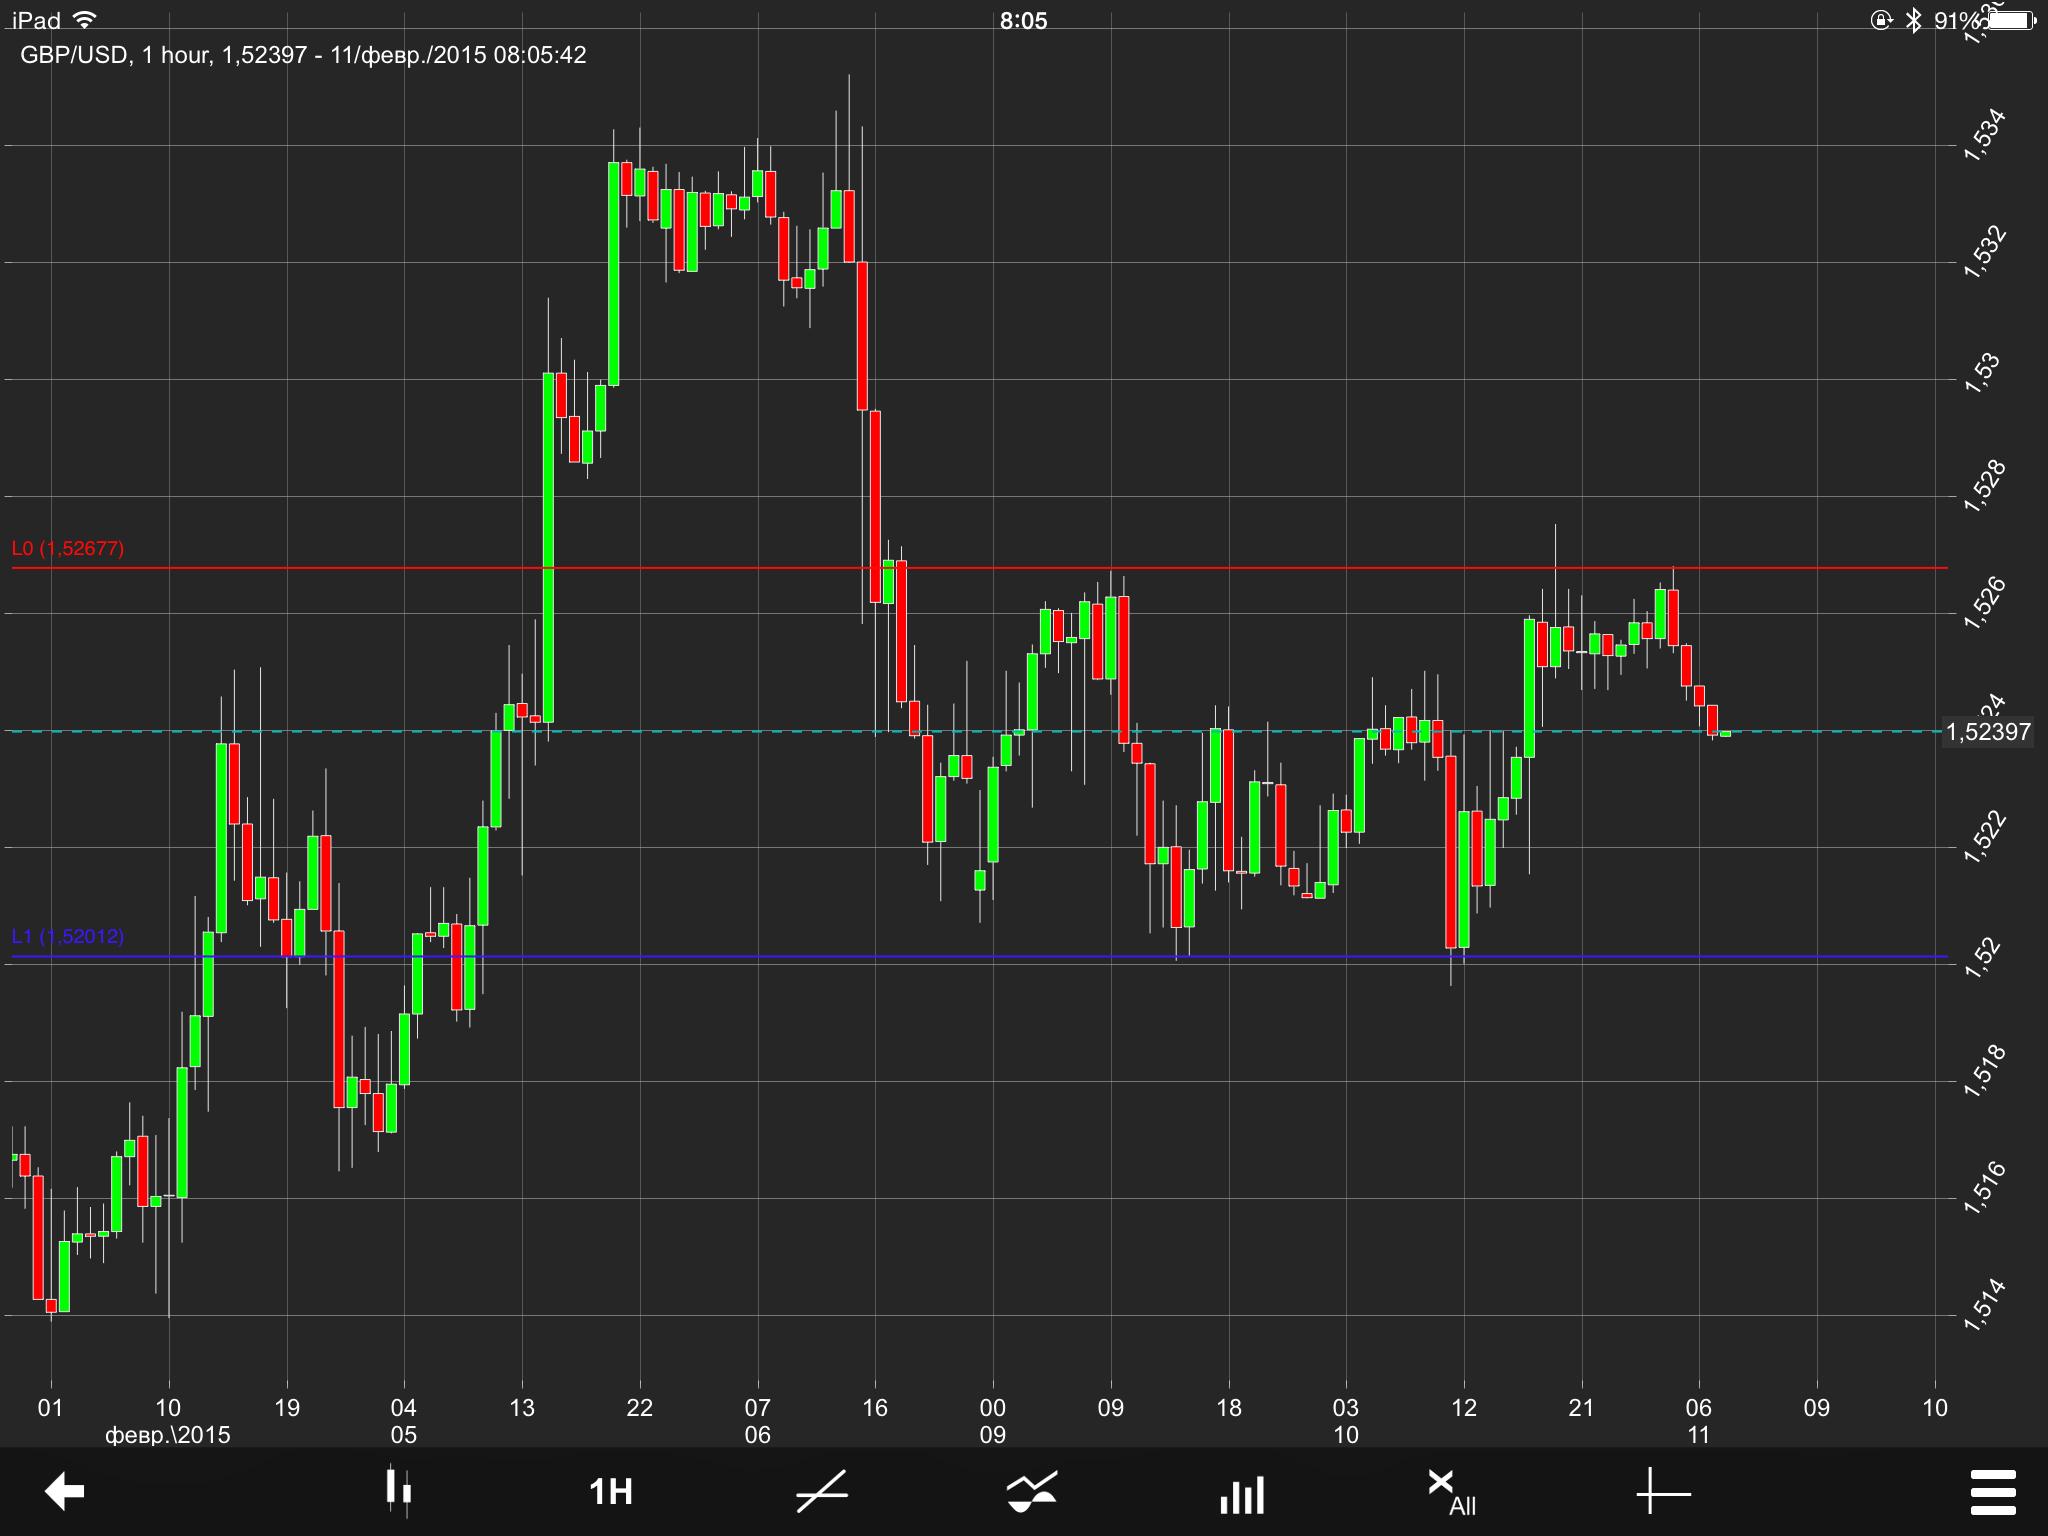 GBP/USD Chart 11 Feb 2015